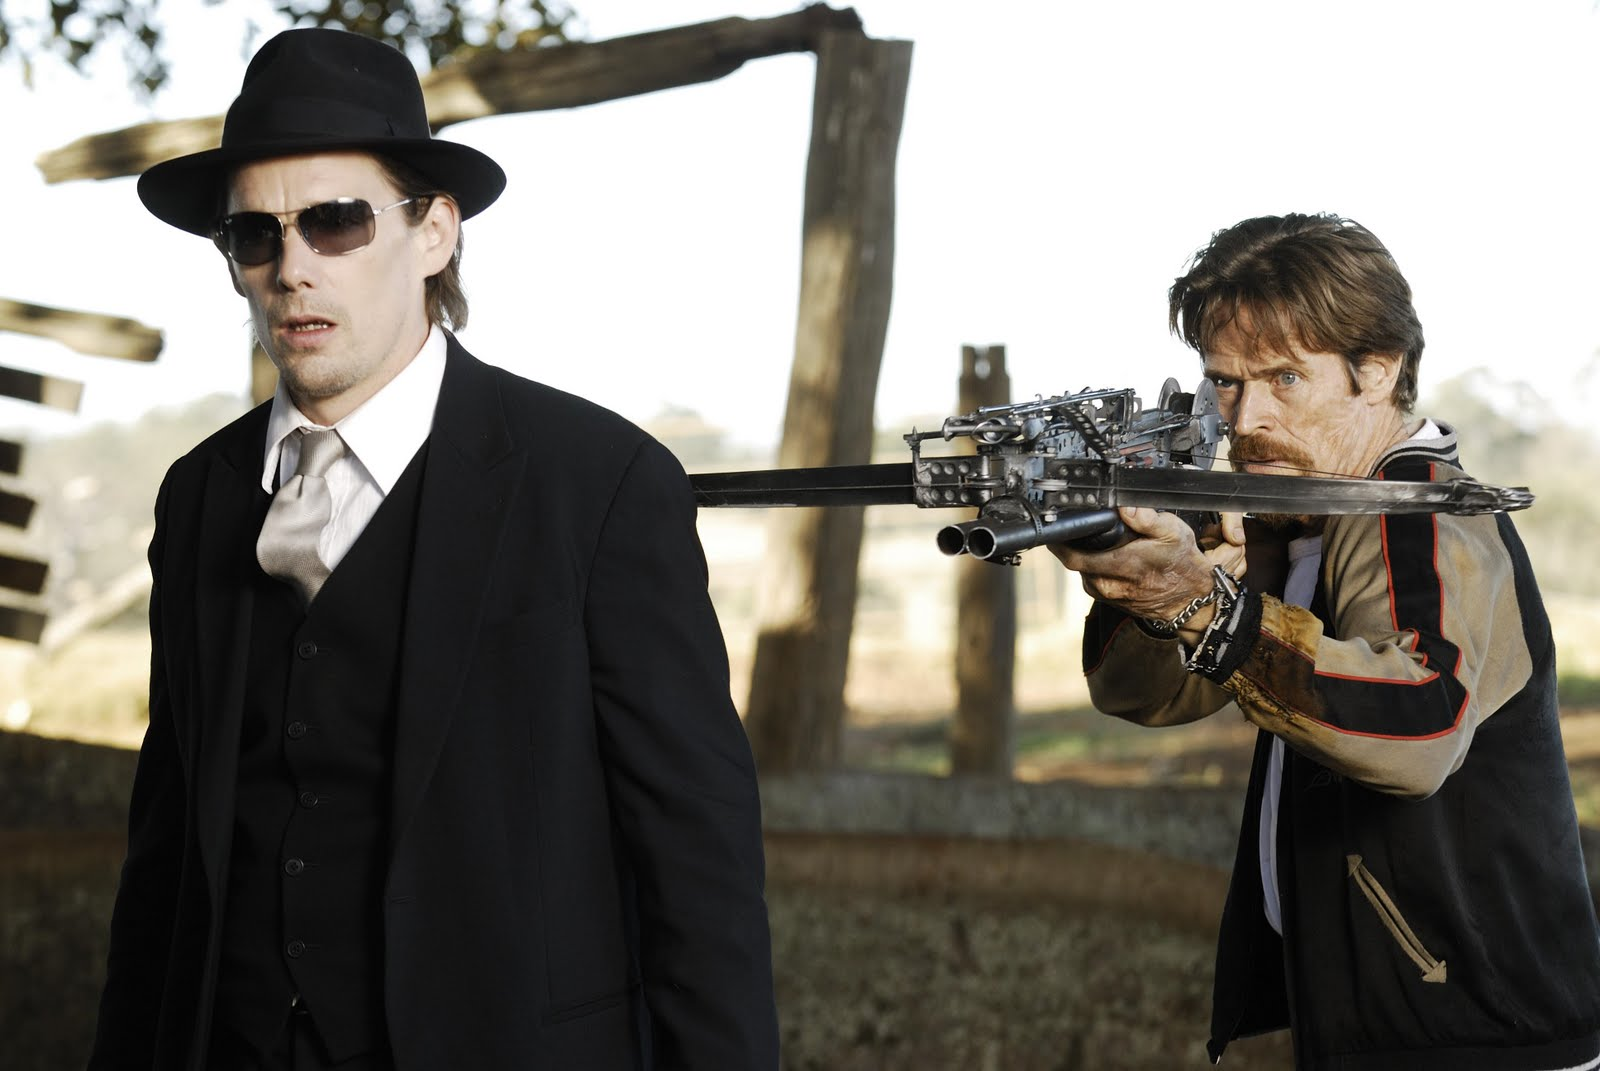 http://4.bp.blogspot.com/_jRJbywFM5FQ/Sw3v7Yoza5I/AAAAAAAAAE0/X7kEZKulkrA/s1600/Daybreakers+Vampire+Movie.jpg